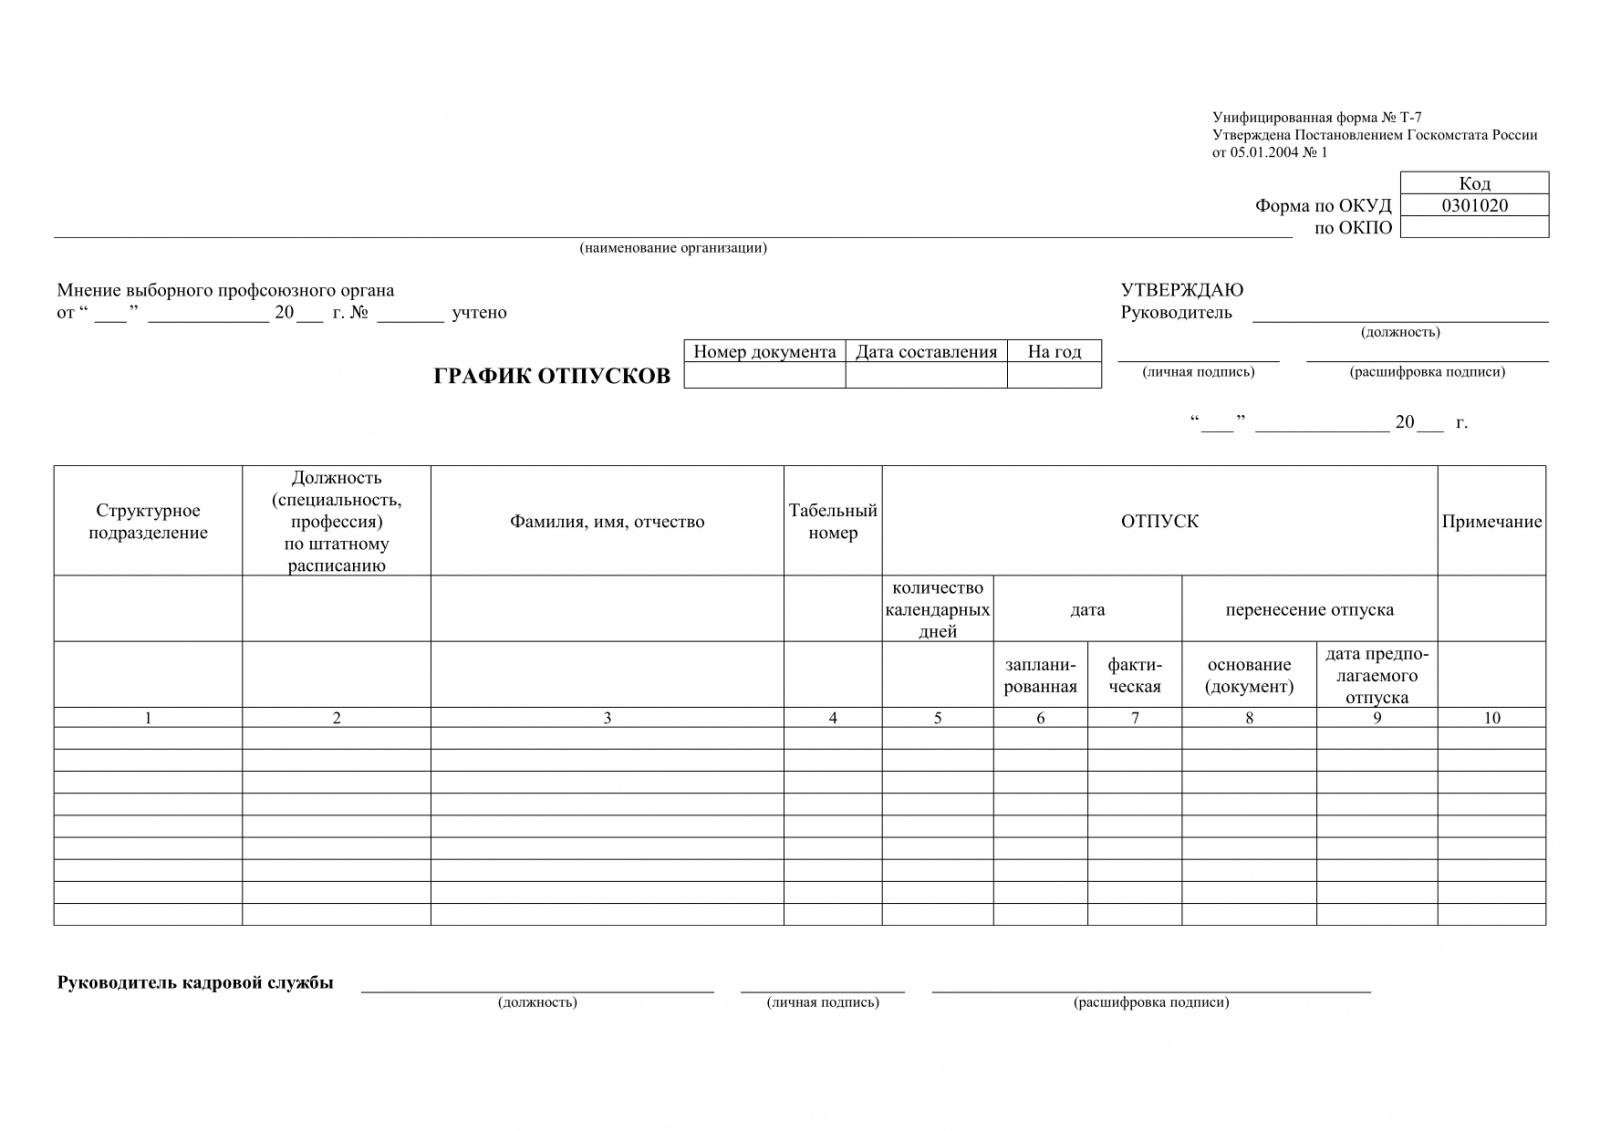 приказ о приеме на работу образец заполнения 2017